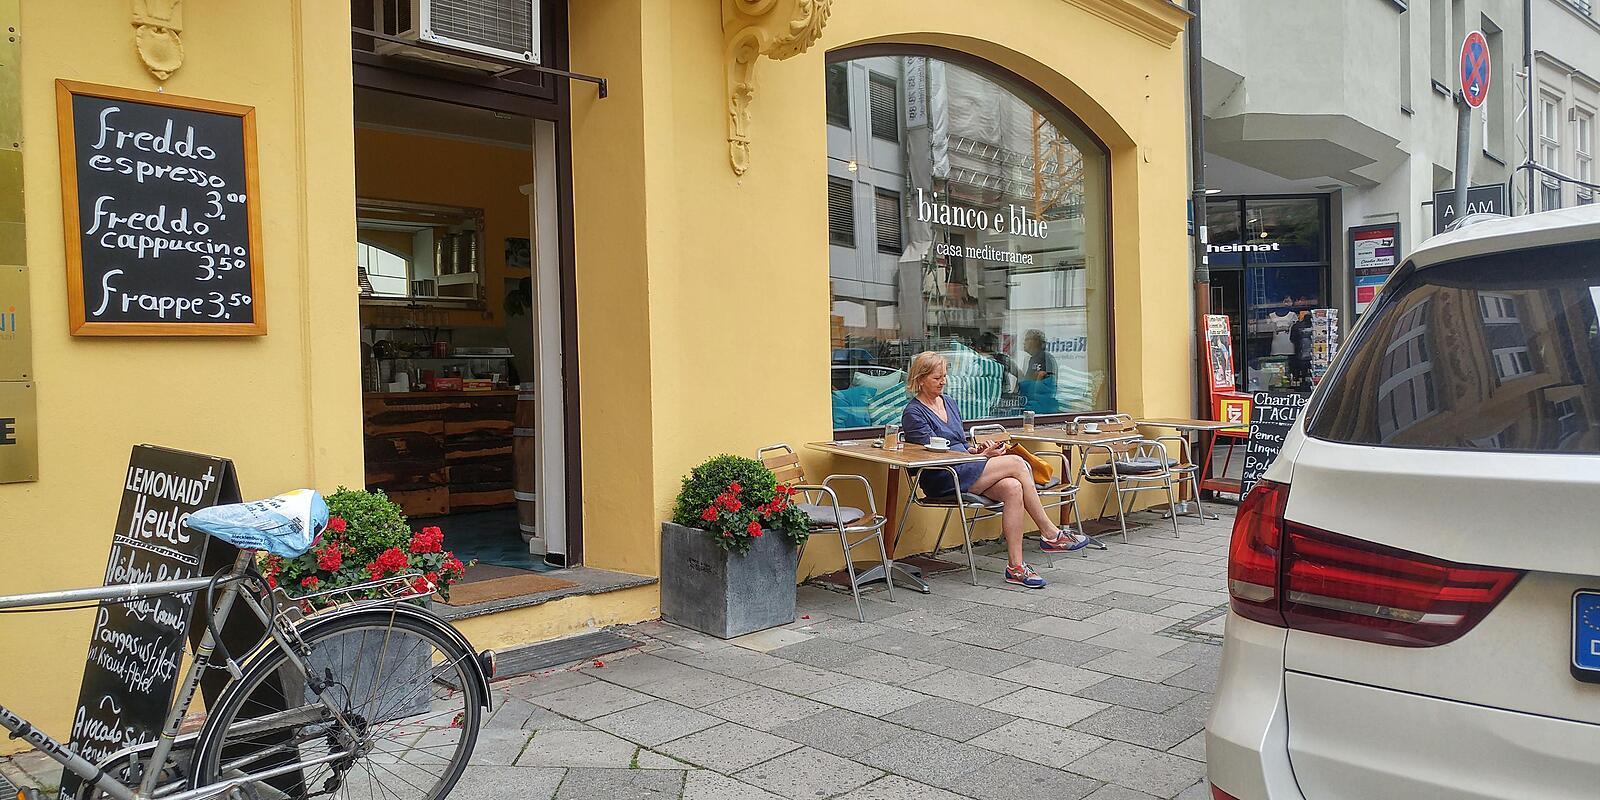 bianco e blue, Brunnstr. Altstadt, München - Café Willkommen